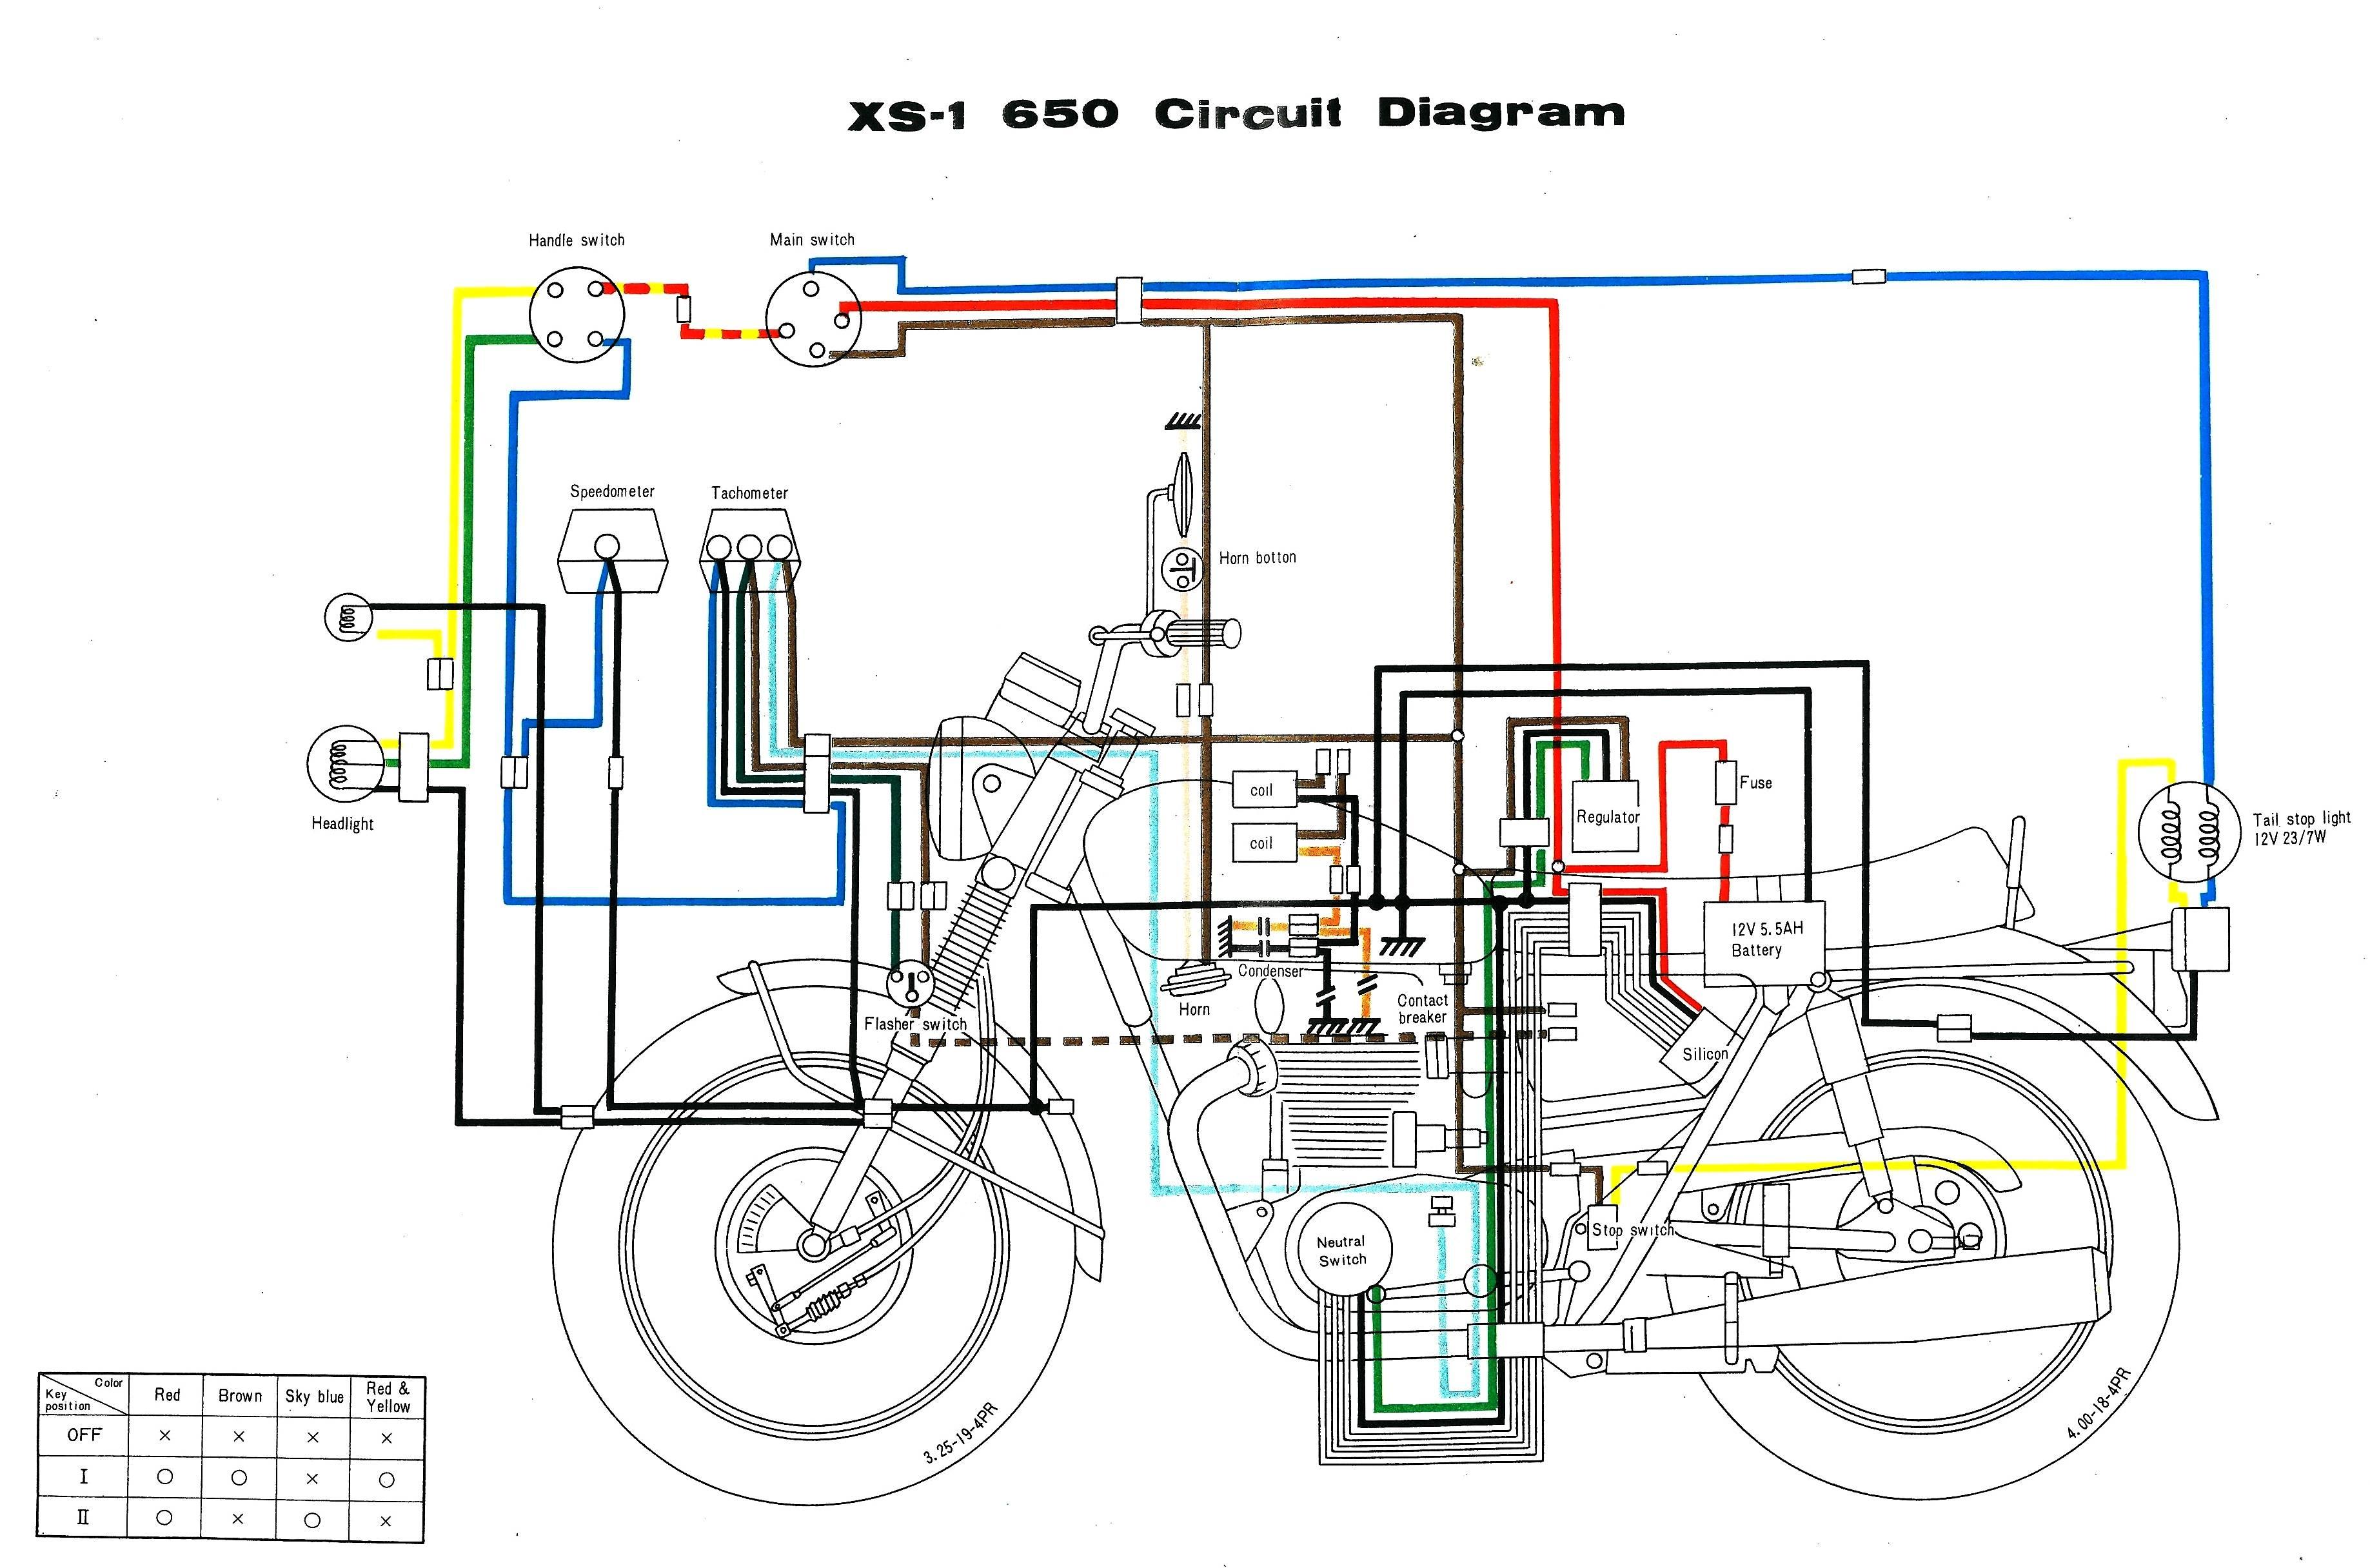 Electrical Schematics Diagram - Wiring Diagram Data - Electrical Wiring Diagram